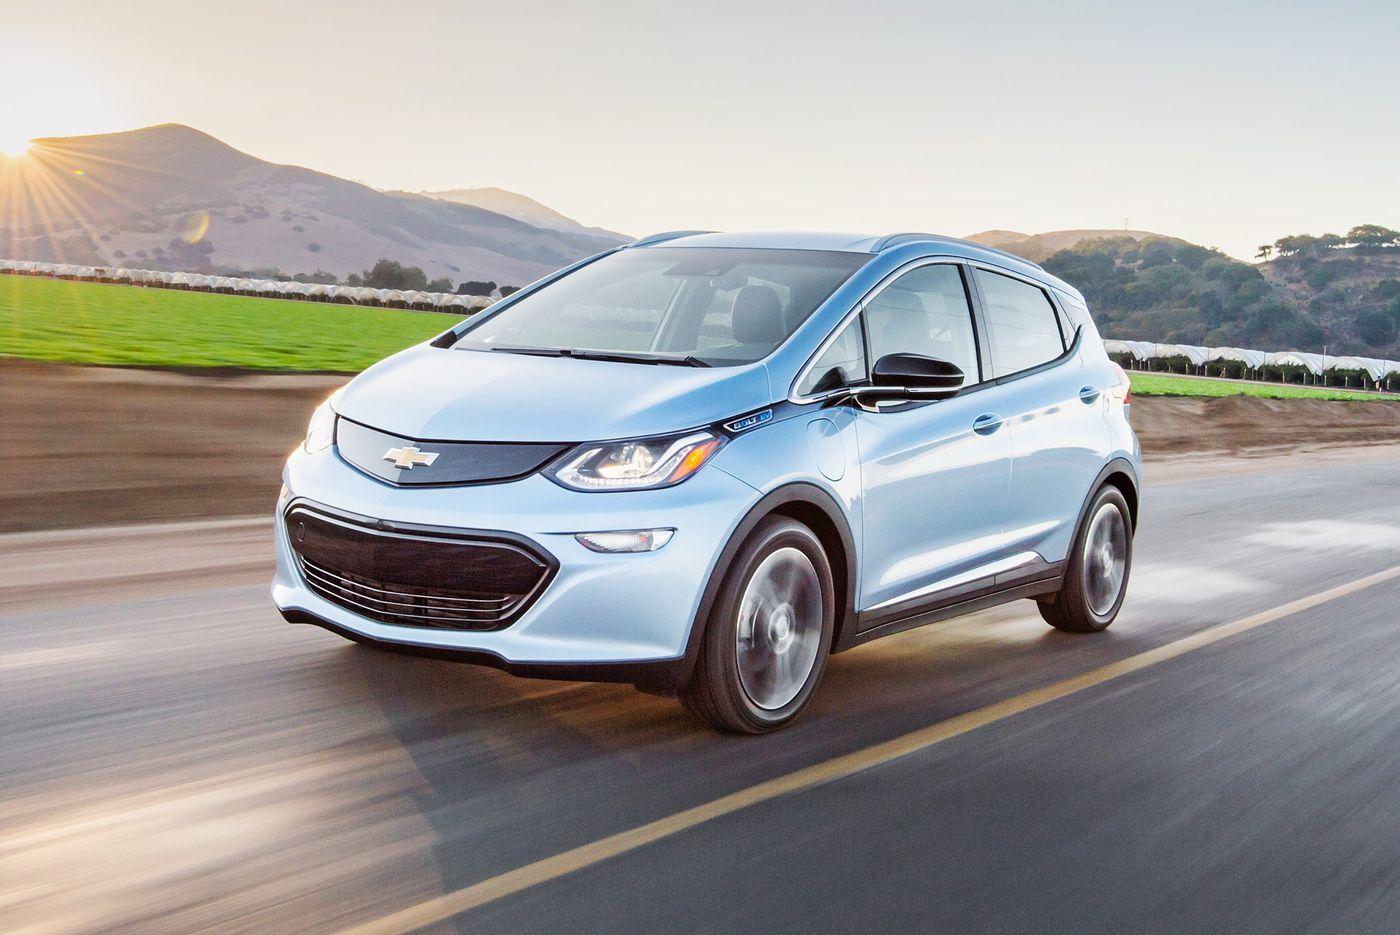 2018 Chevrolet Bolt EV: An everyday electric econobox | Scott Sturgis